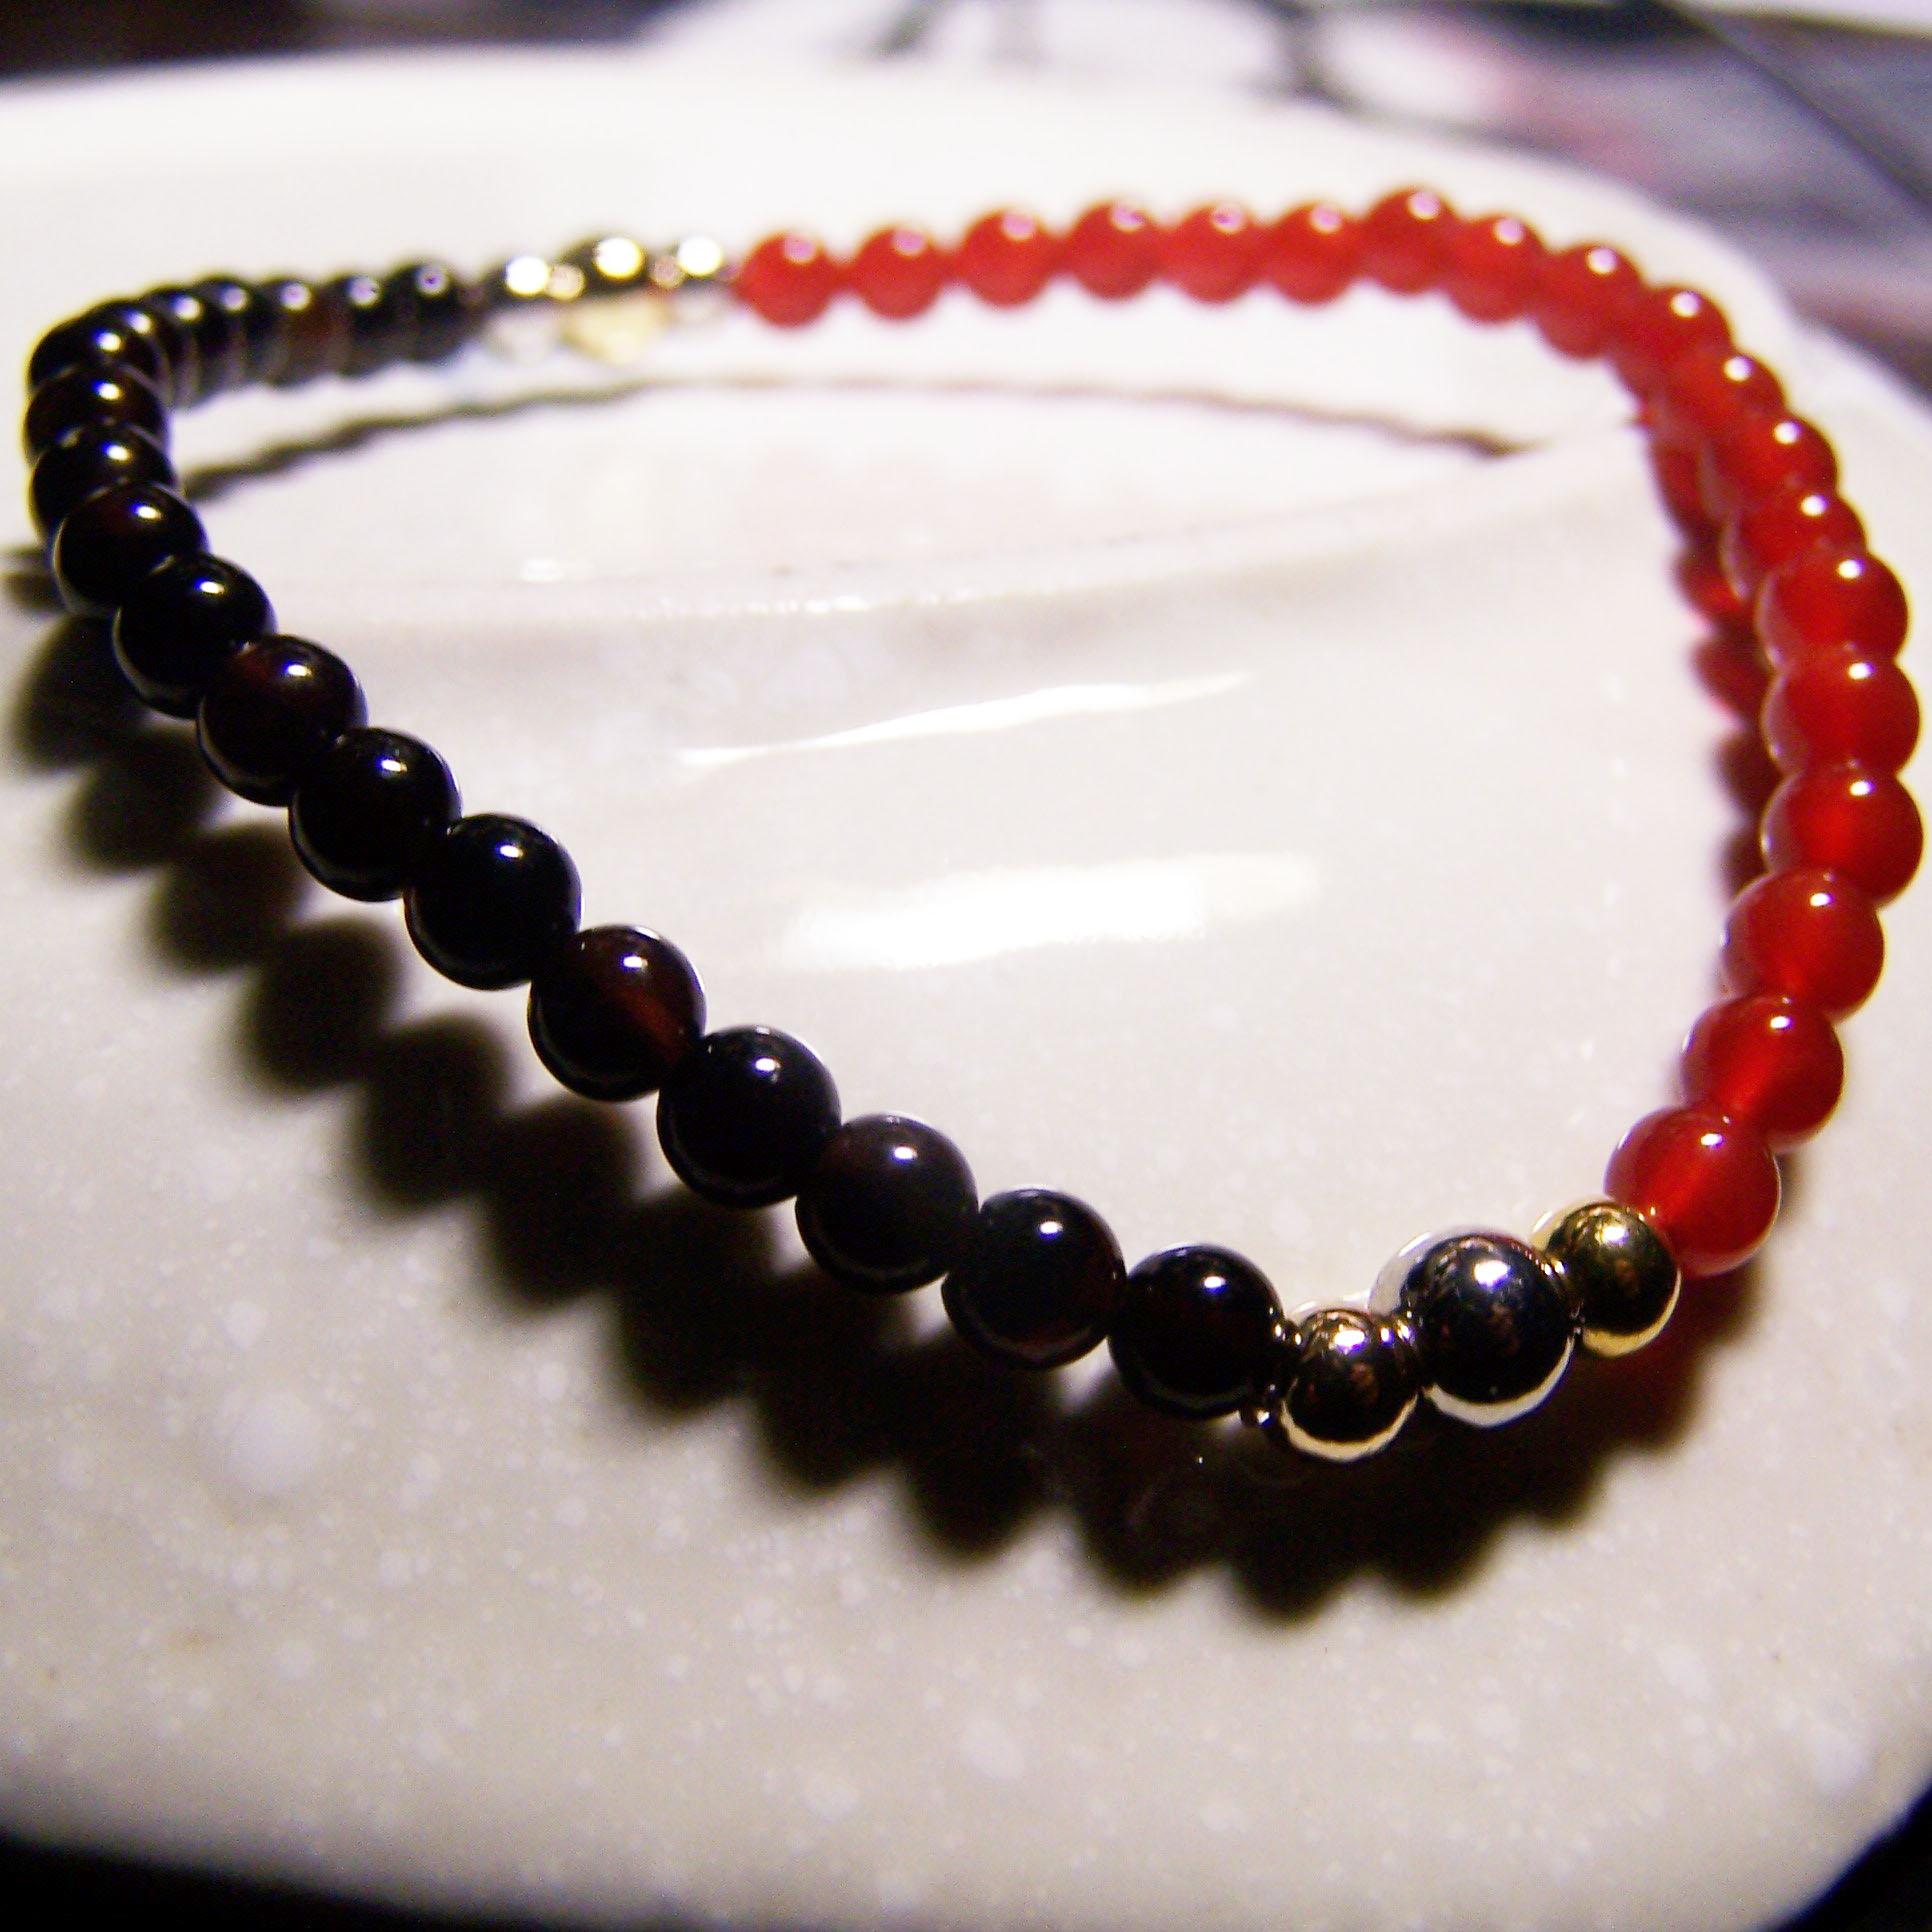 be young【比漾】Mini 秀麗手環 (紅+黑瑪瑙) 單圈手鏈 2